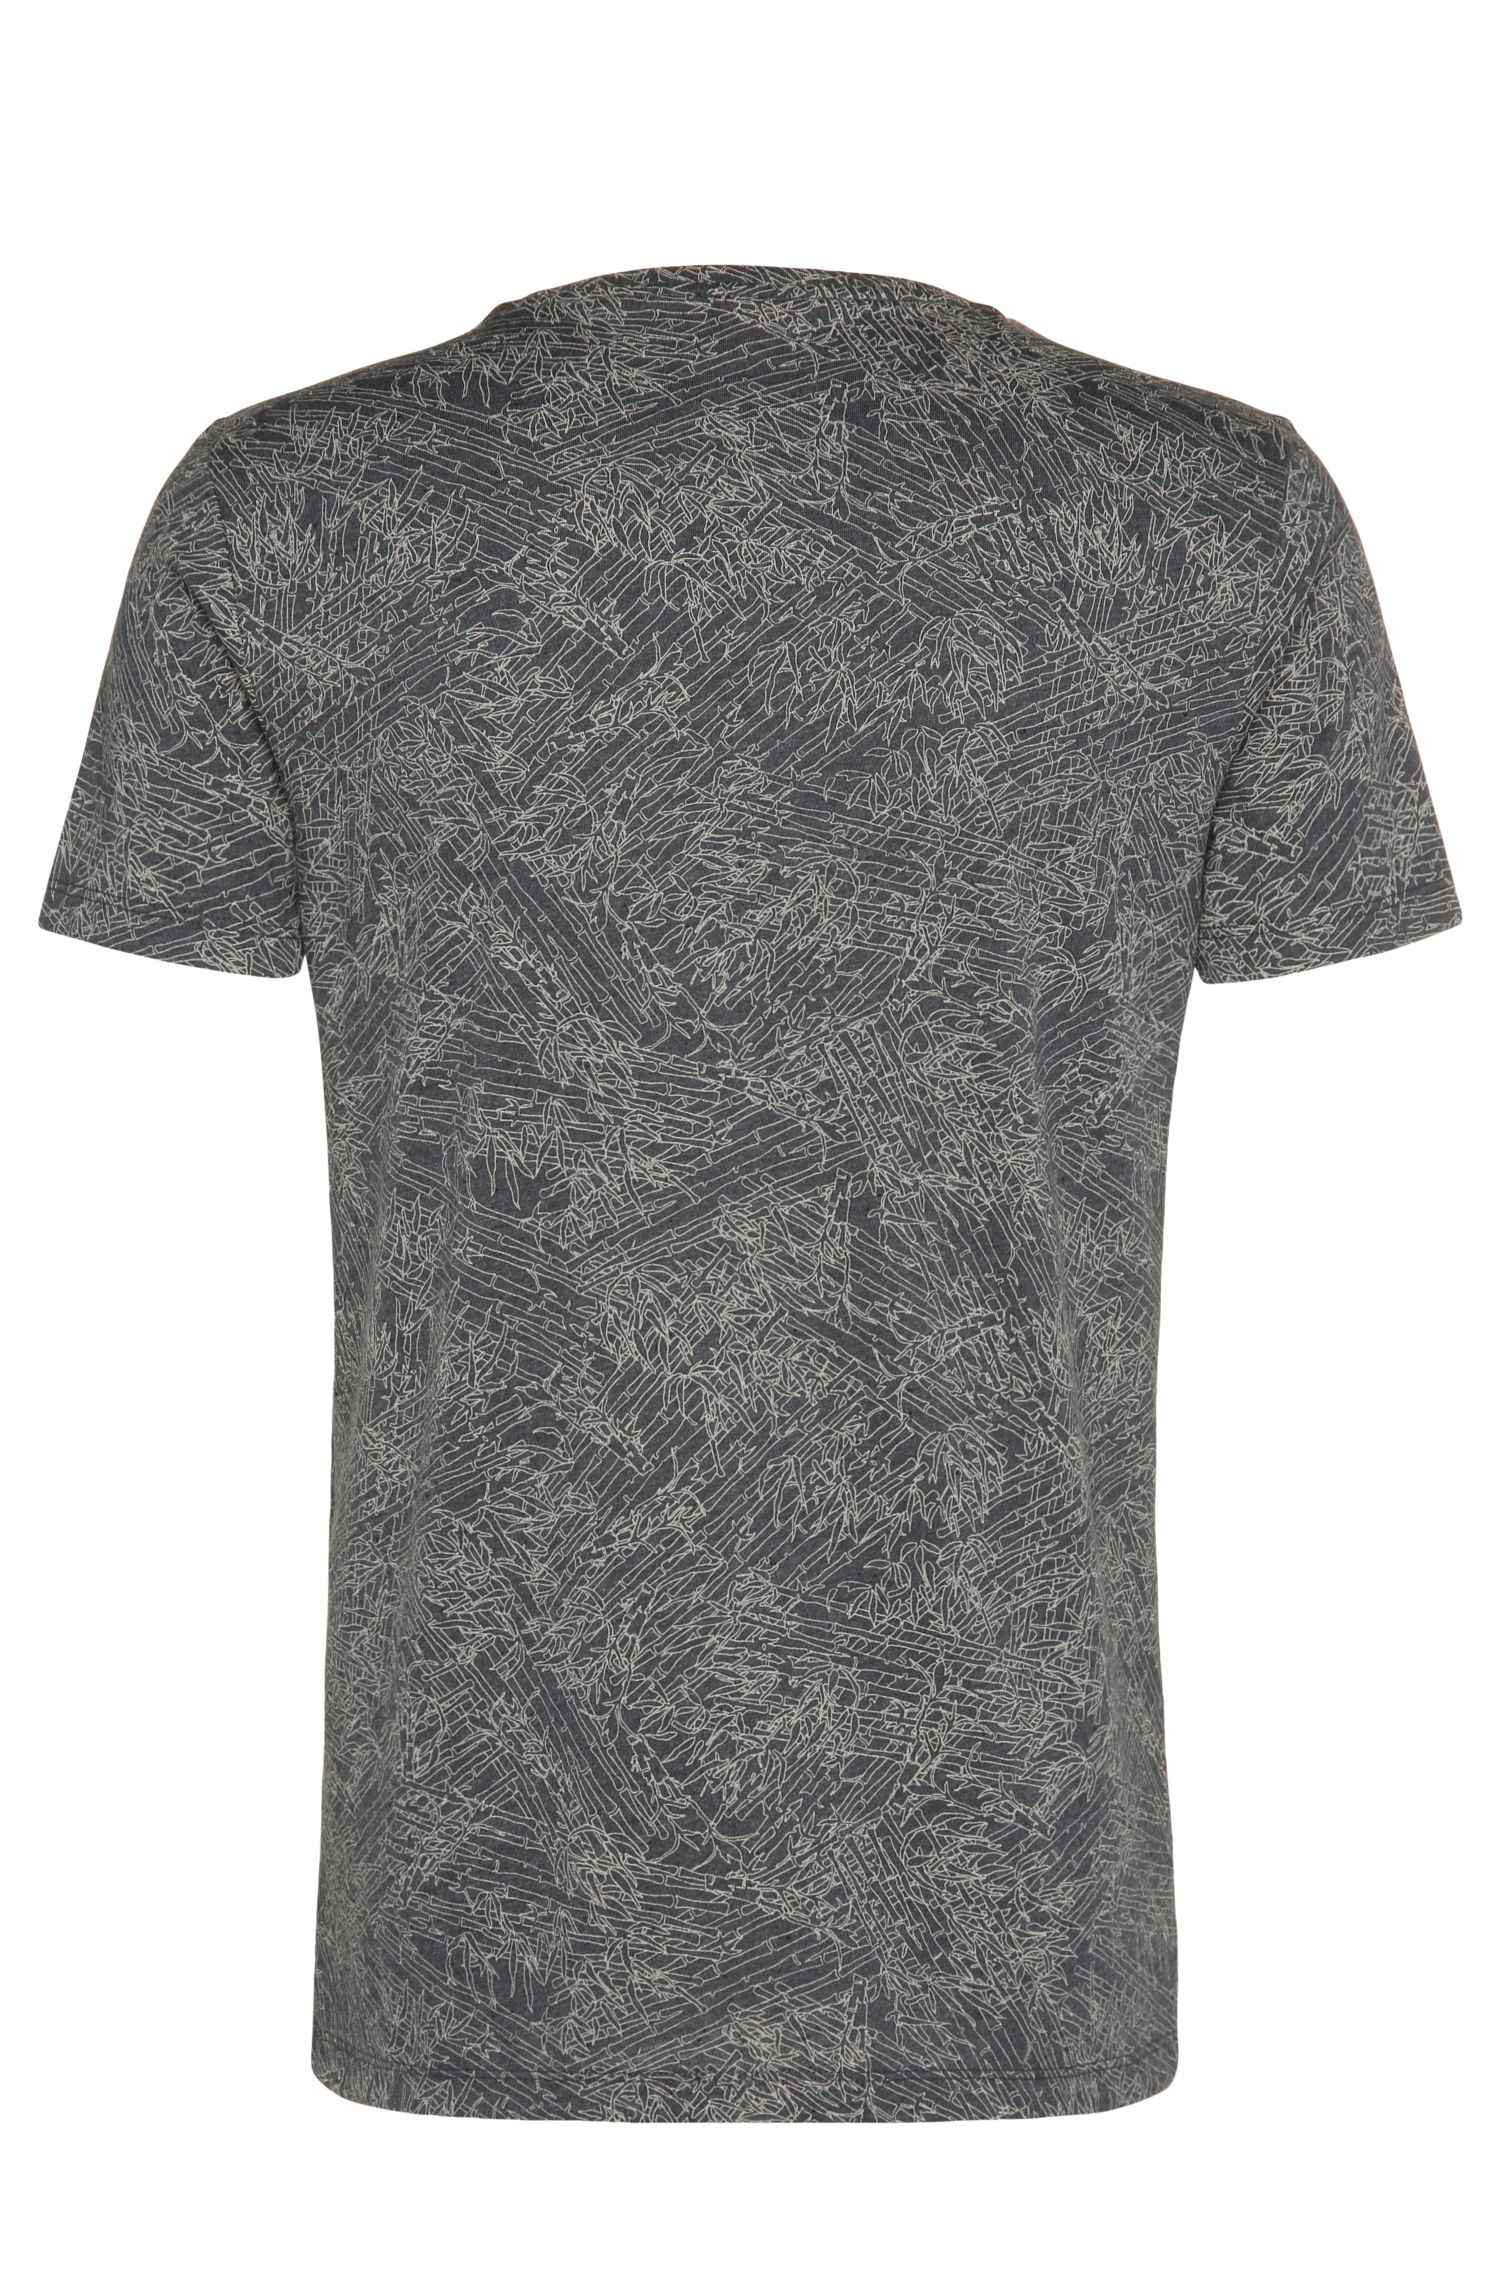 Gemustertes Relaxed-Fit T-Shirt aus Material-Mix mit Baumwolle und Modal: ´Tauryon`